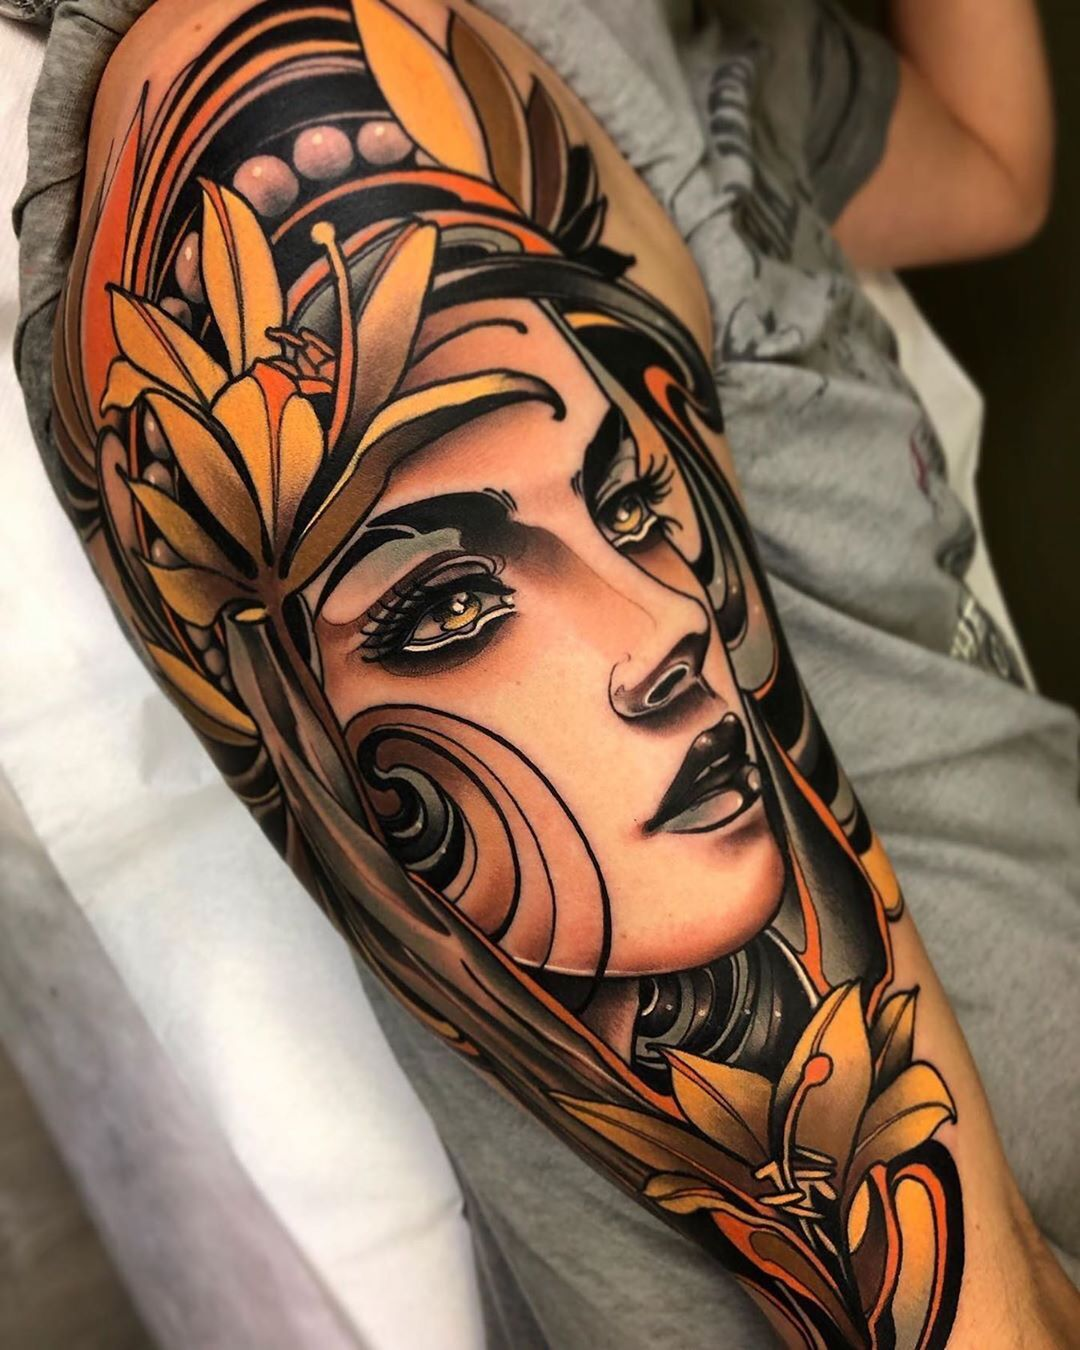 Tattoo Art Gallery On Instagram Tattoo By Fedealmanzor Neotraditional Neotraditional Tattoo Neotr Neo Traditional Tattoo Neo Tattoo Valkyrie Tattoo